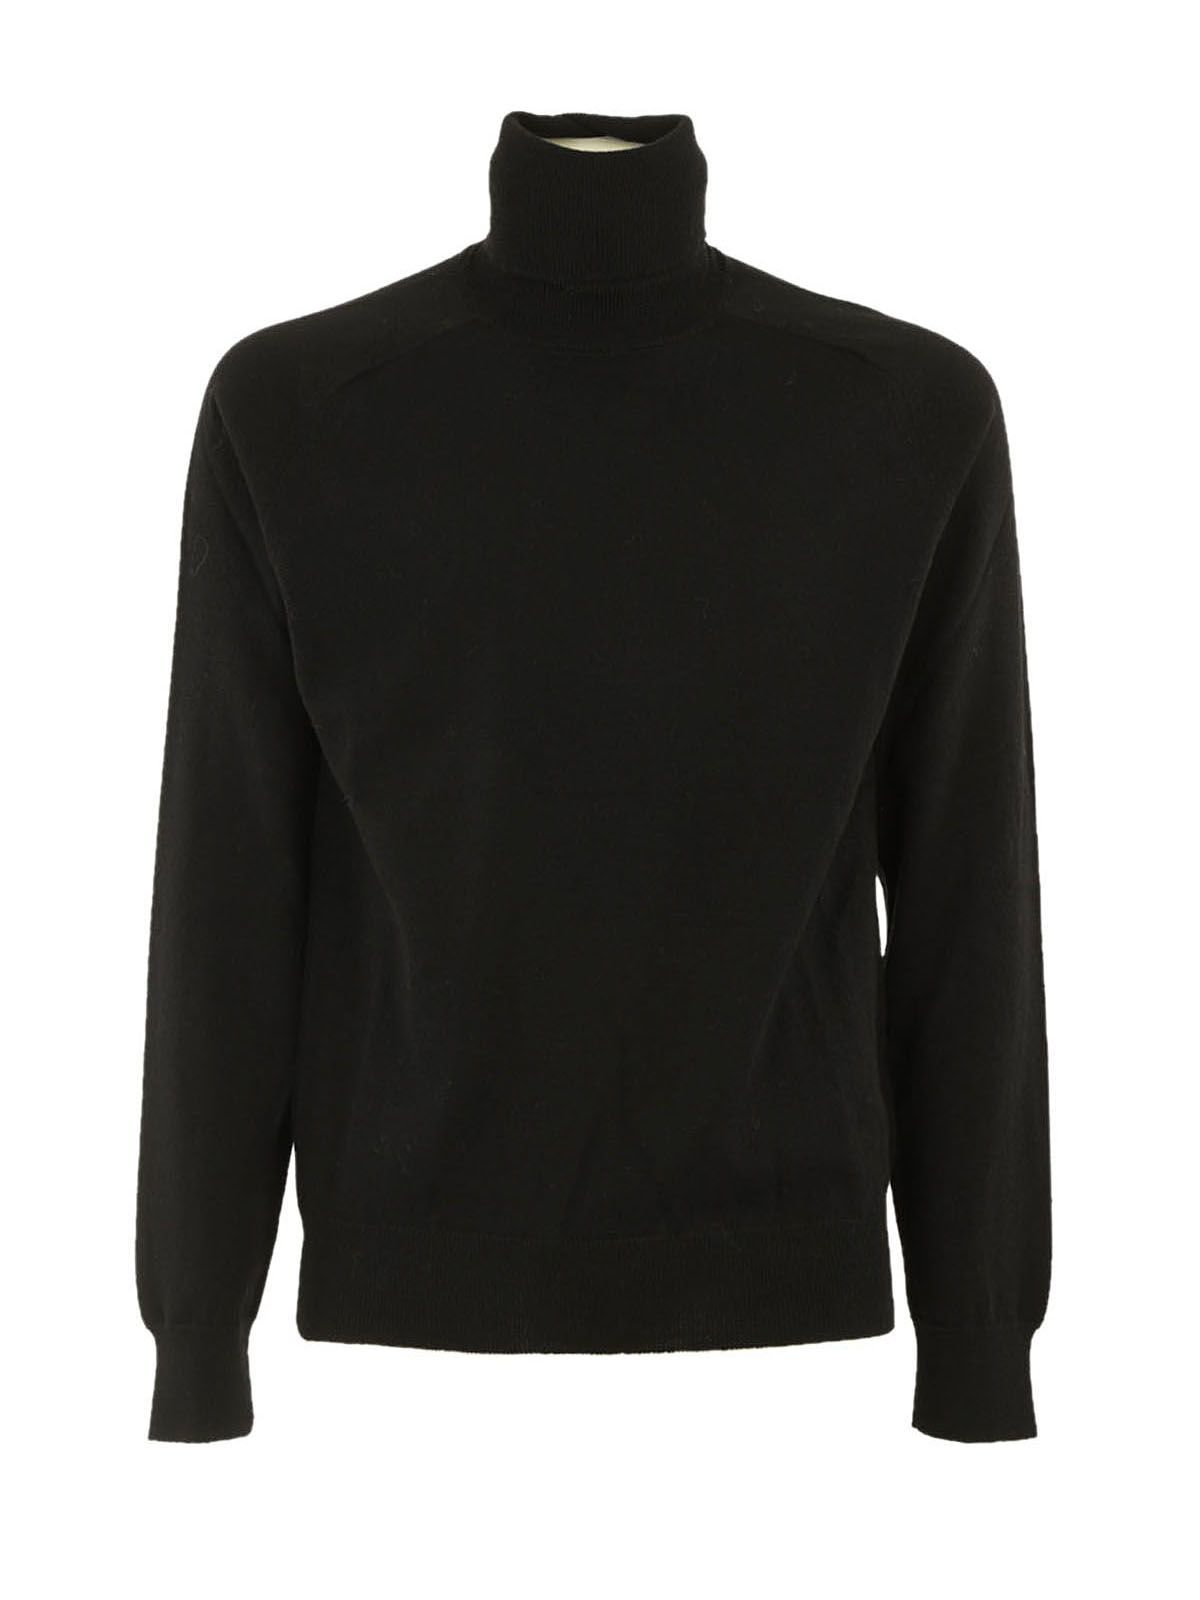 Ami Turtle Neck Sweater